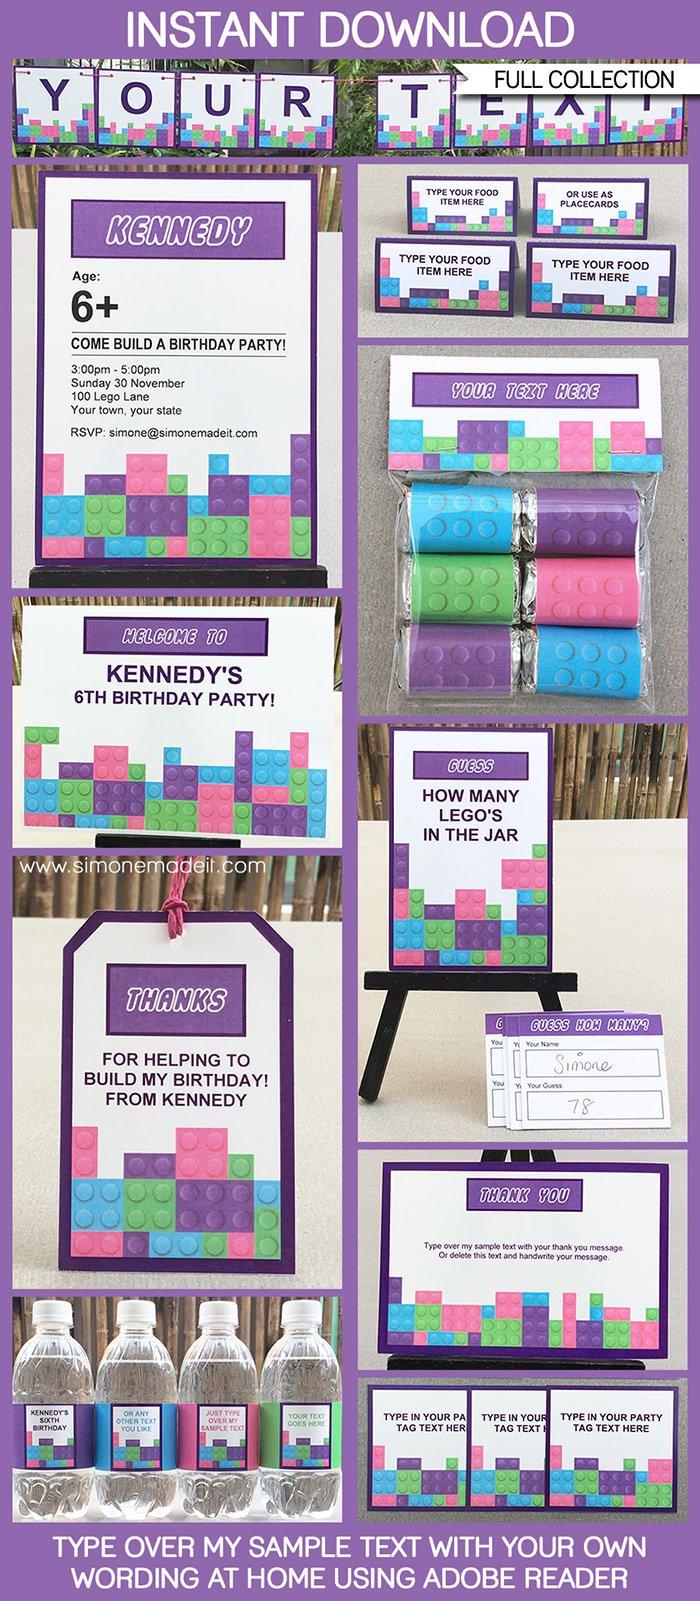 lego friends birthday invitations printable